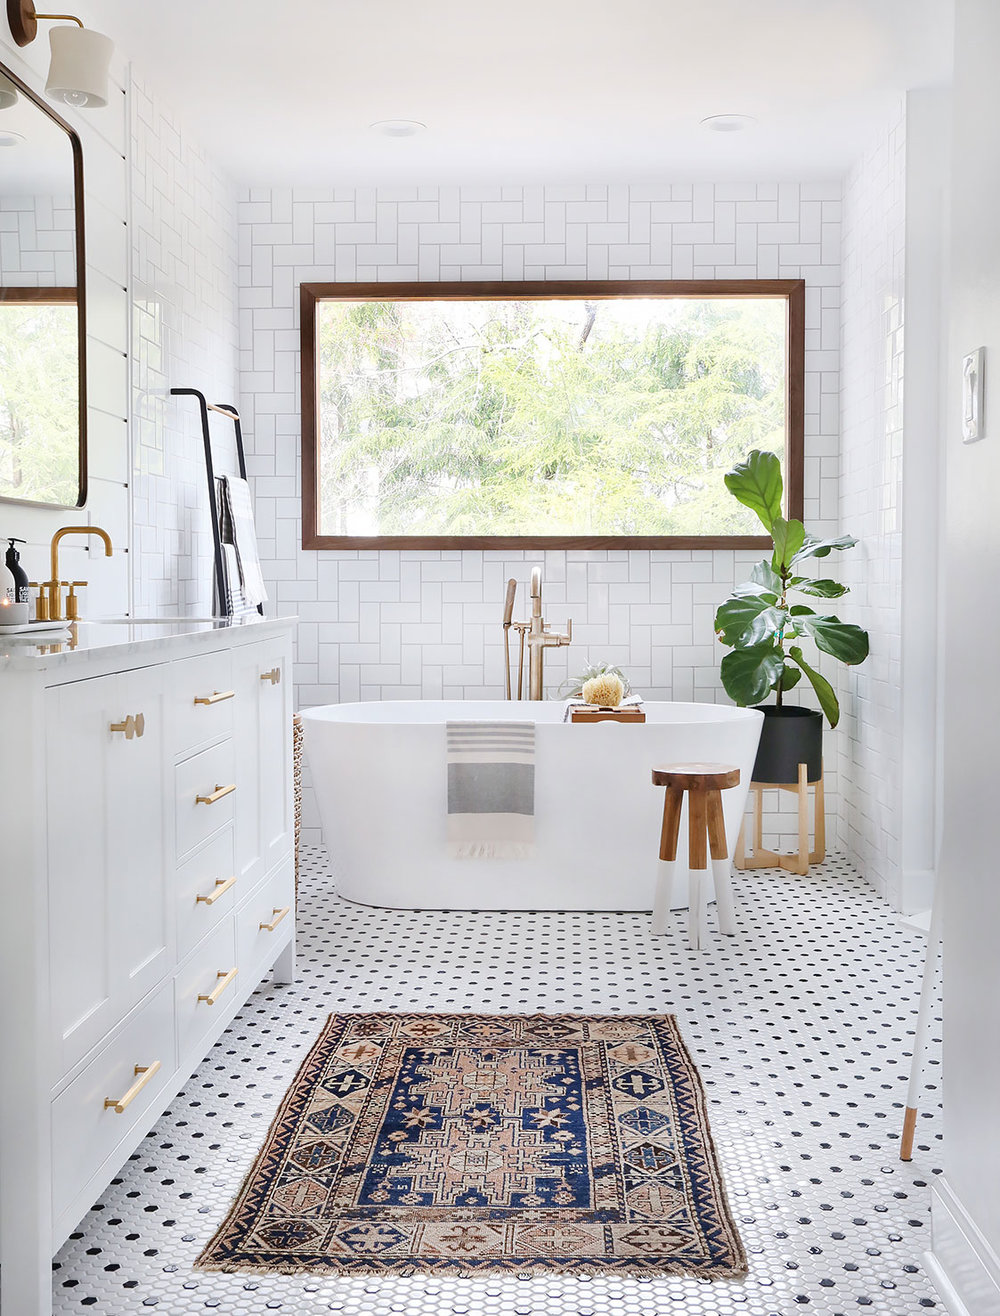 45 Master Bathroom Ideas 2019 (That Will Awe You)